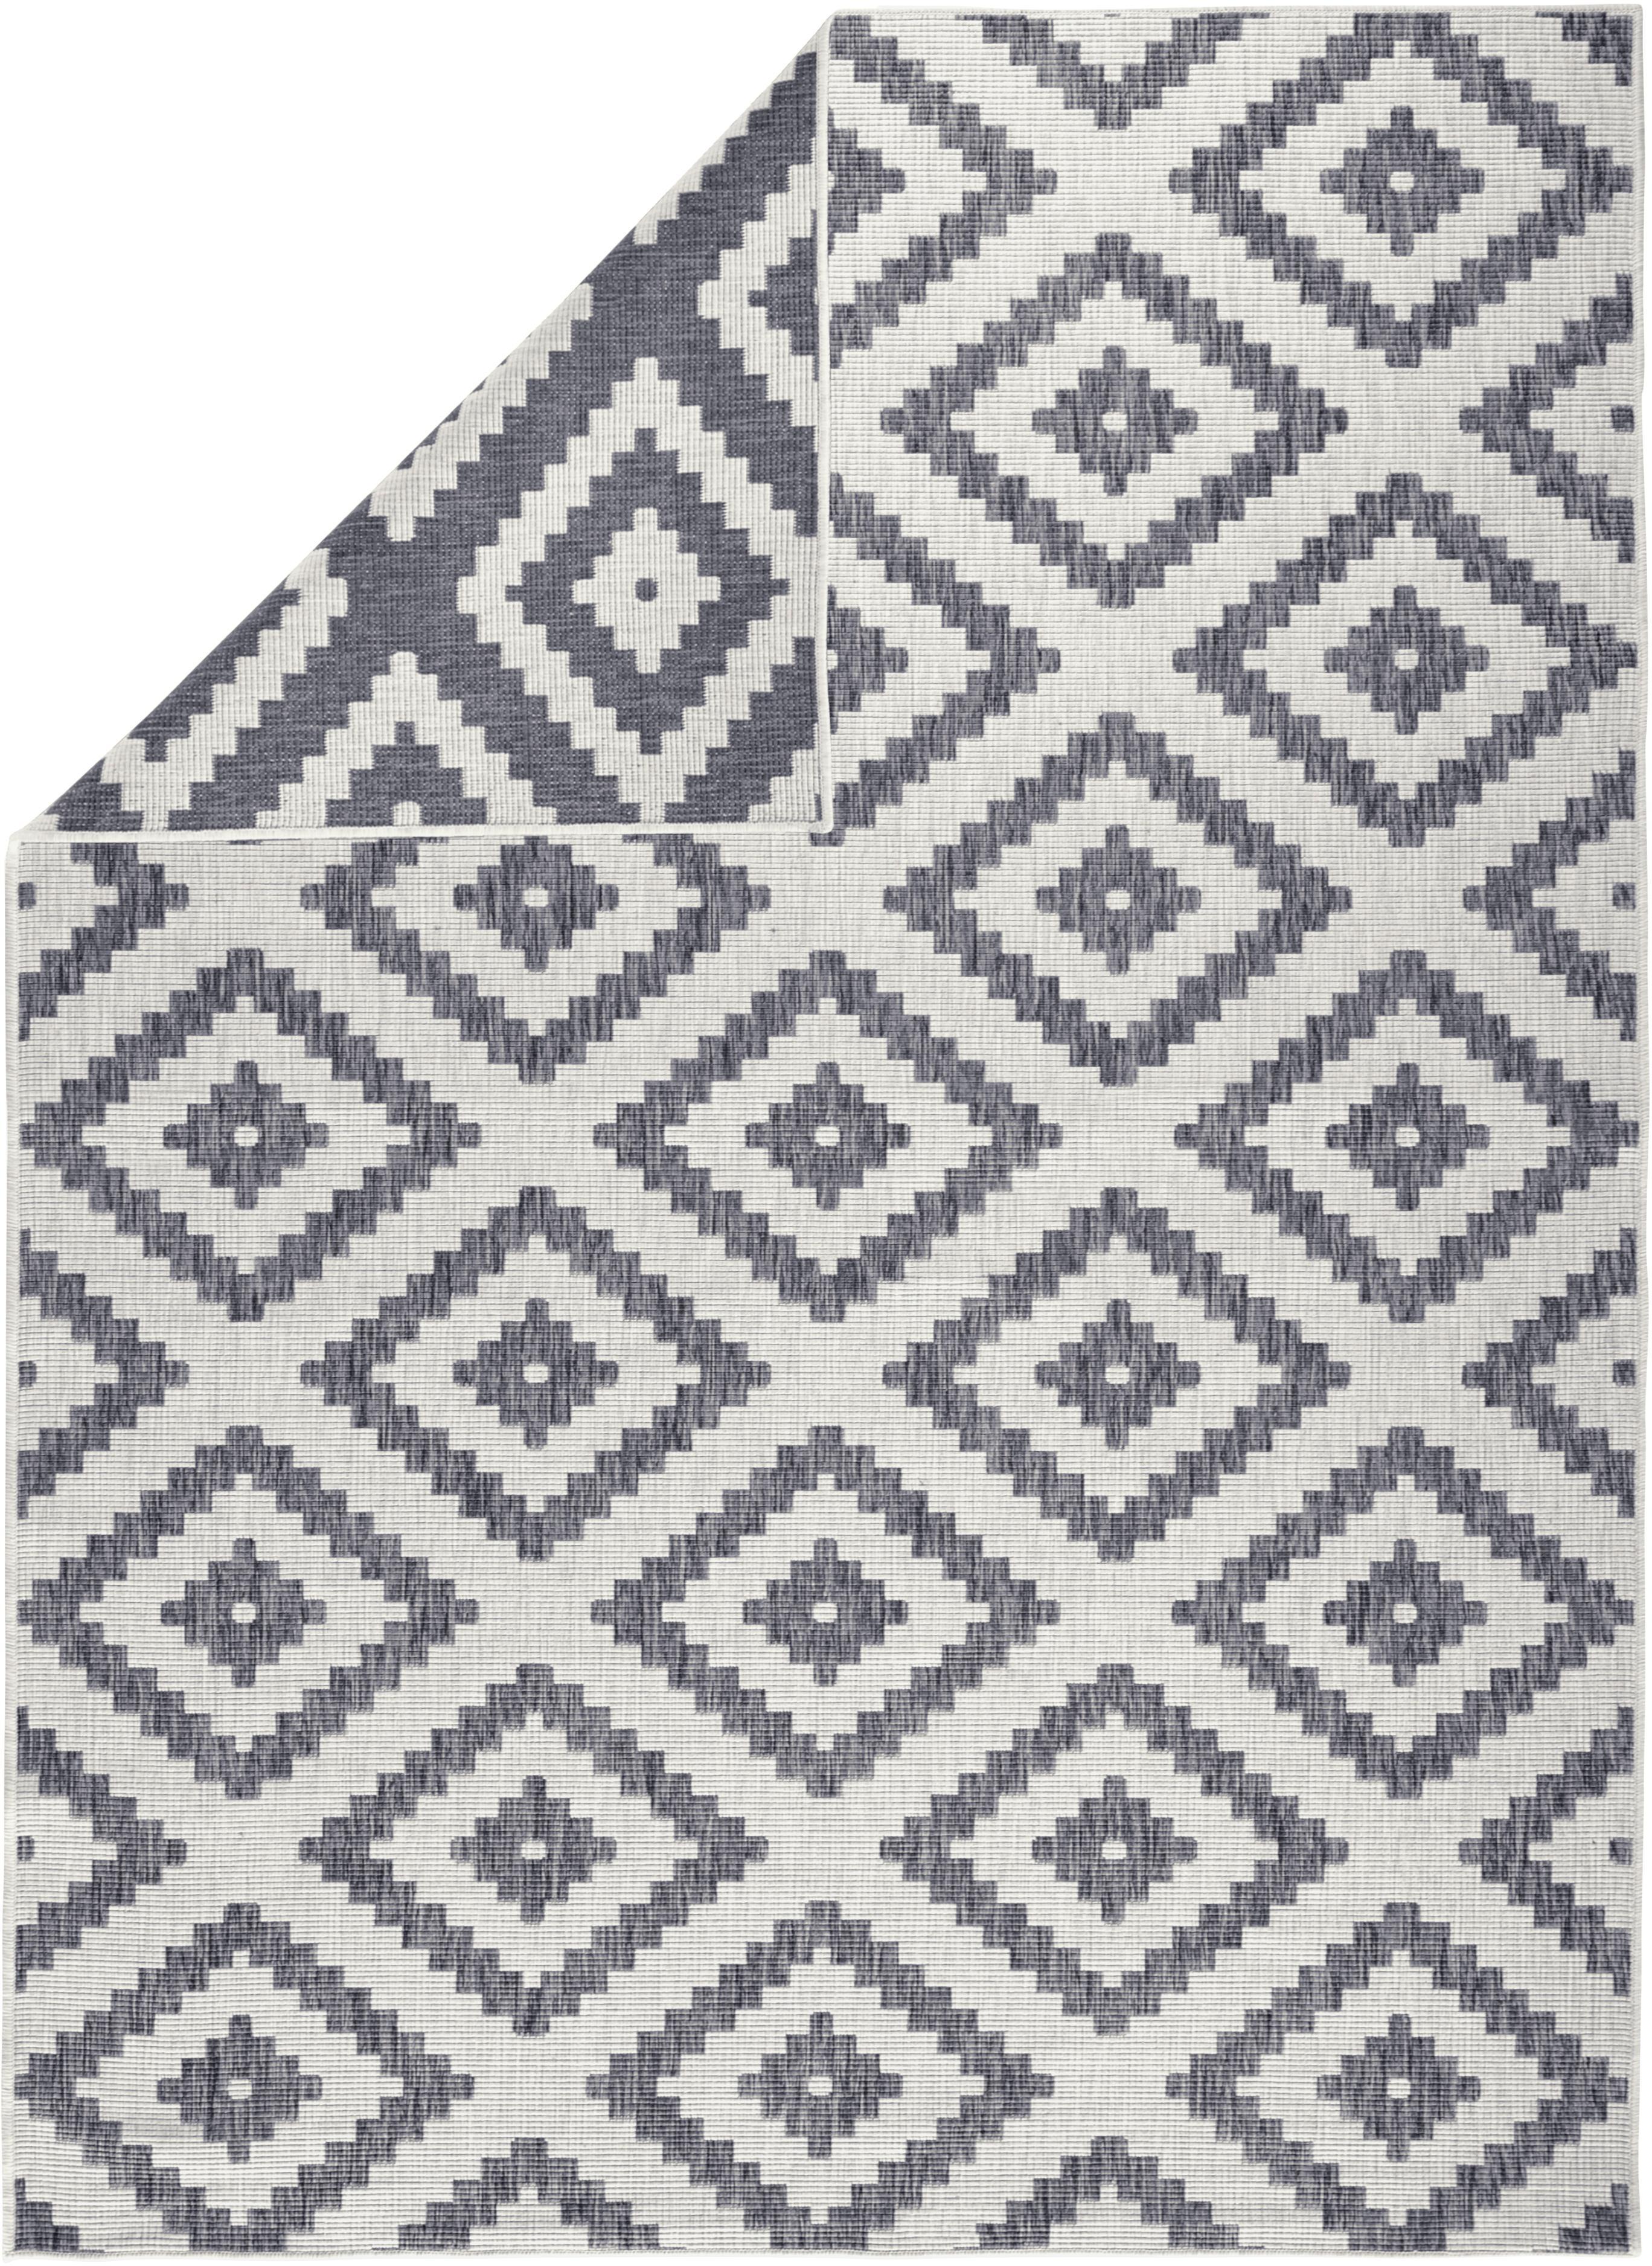 Alfombra redonda reversible de interior/exterior Malta, Gris, crema, An 160 x L 230 cm (Tamaño M)